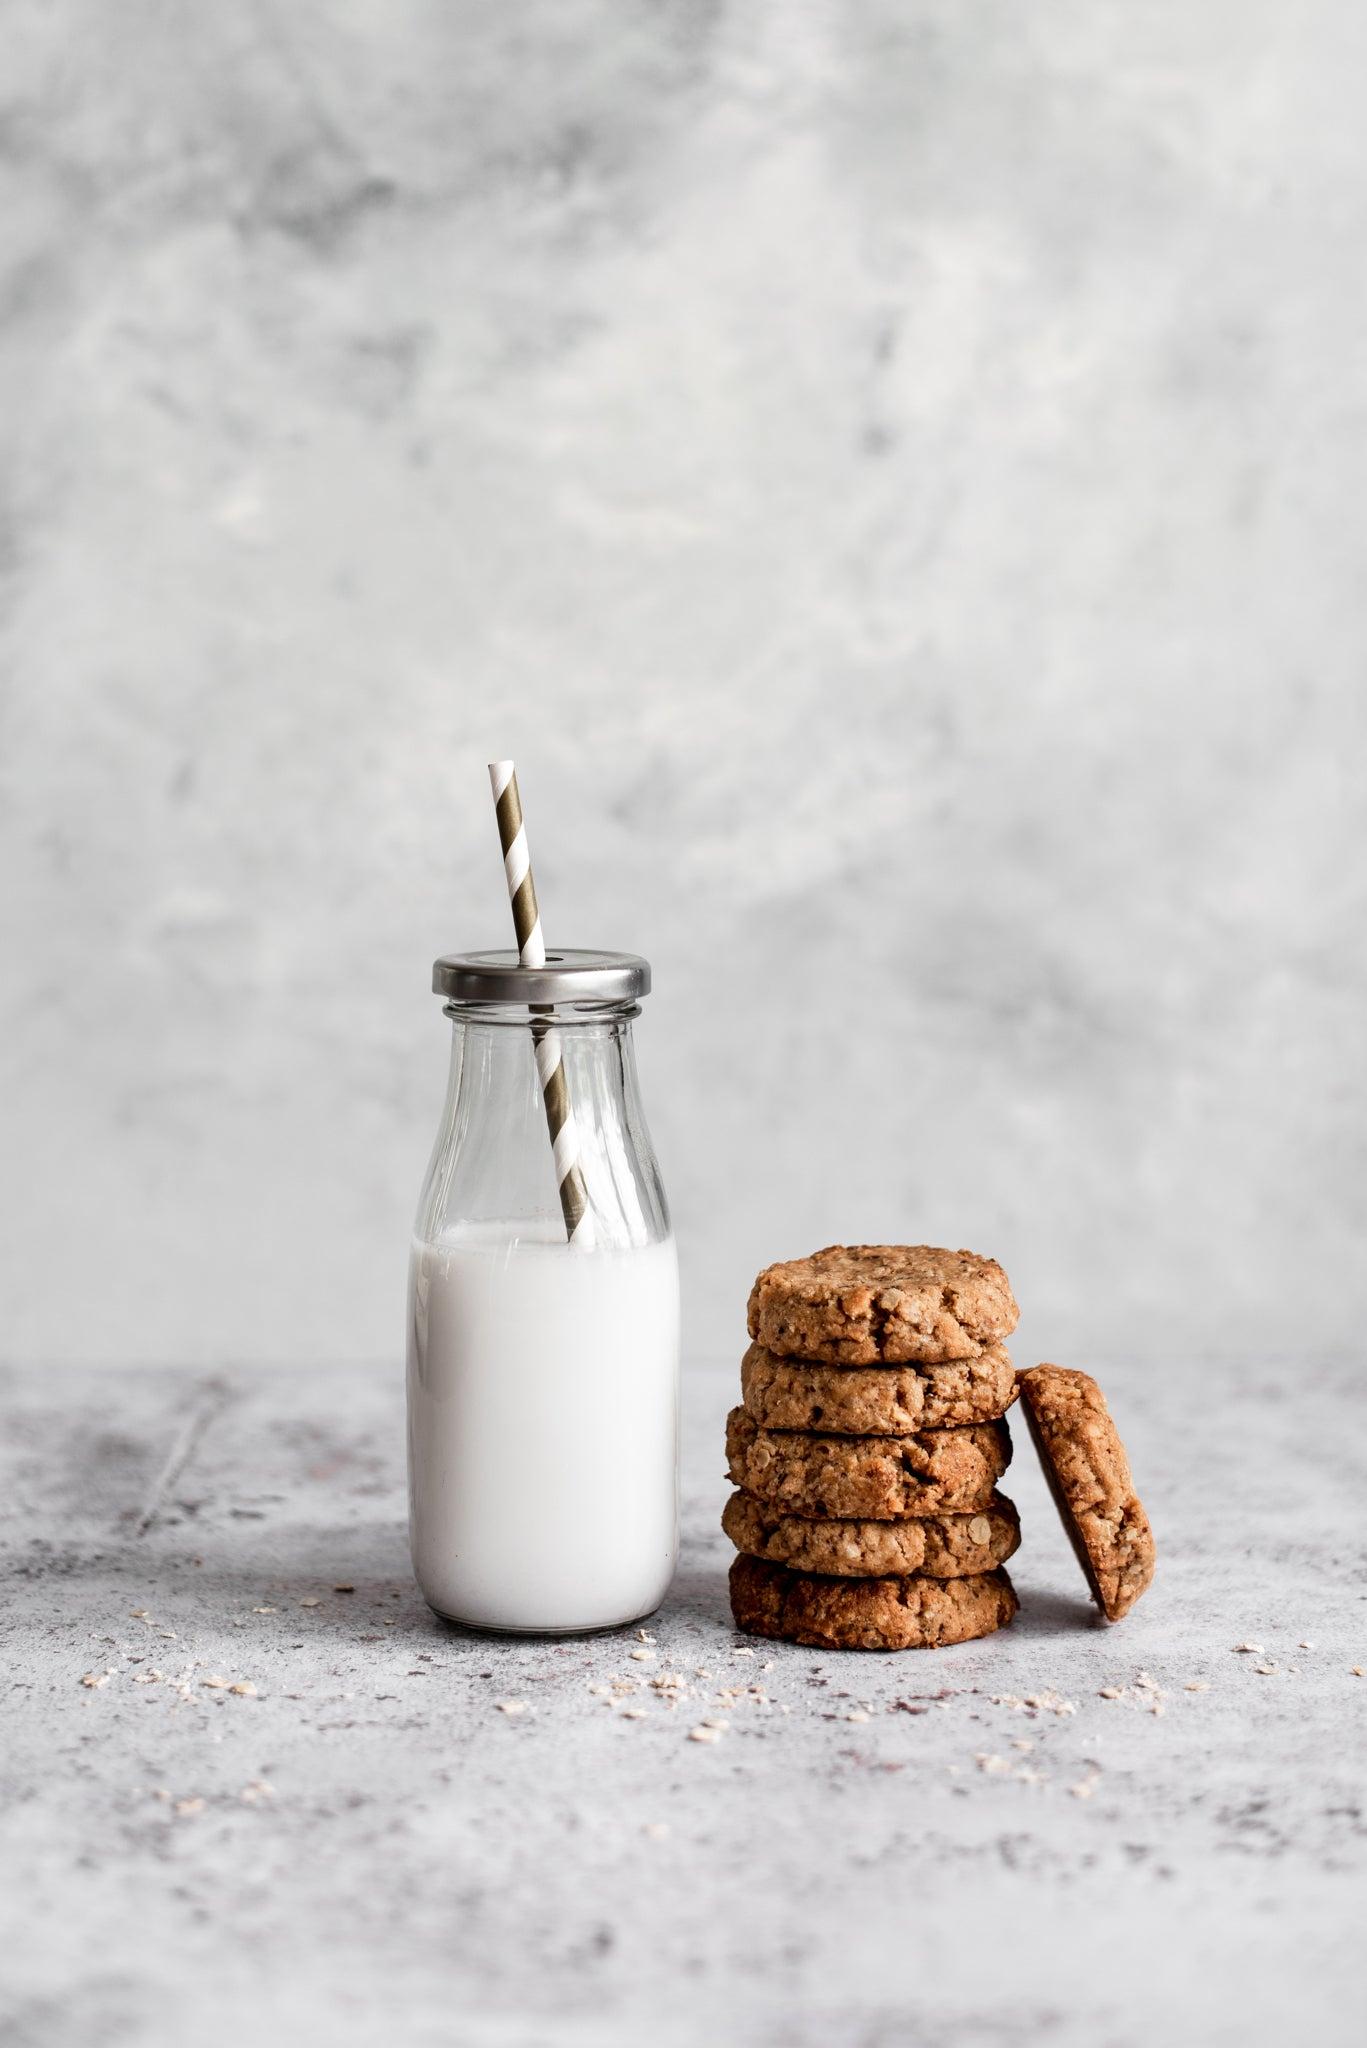 Gluten-Free-And-Vegan-Almond-Butter-Cookies-WEB-RES-1.jpg